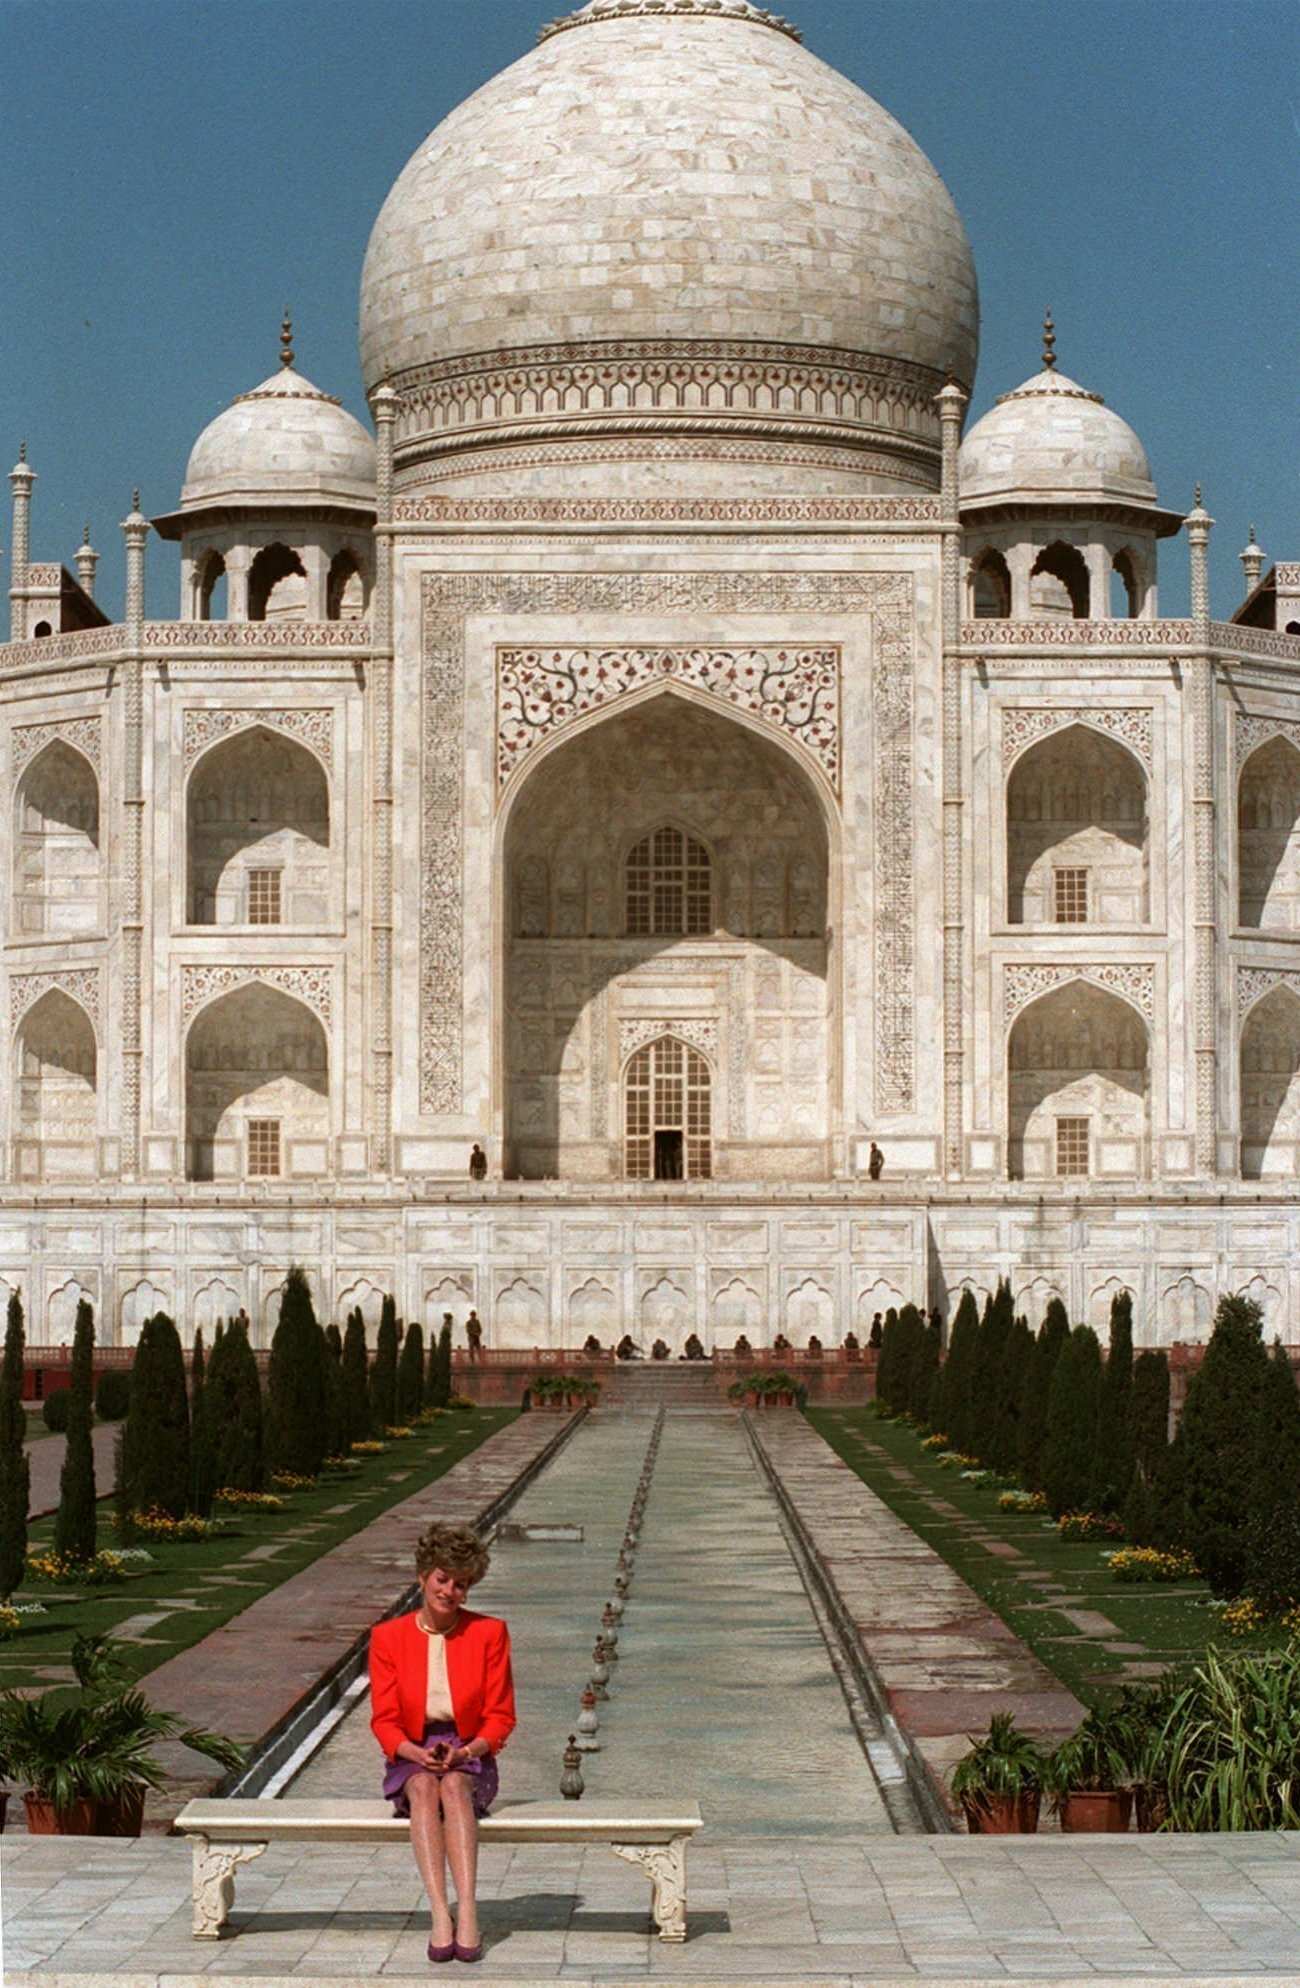 Britain's Princess Diana sits alone backdropped by the Taj Mahal in Agra, India, Feb. 11, 1992. (AP Photo)